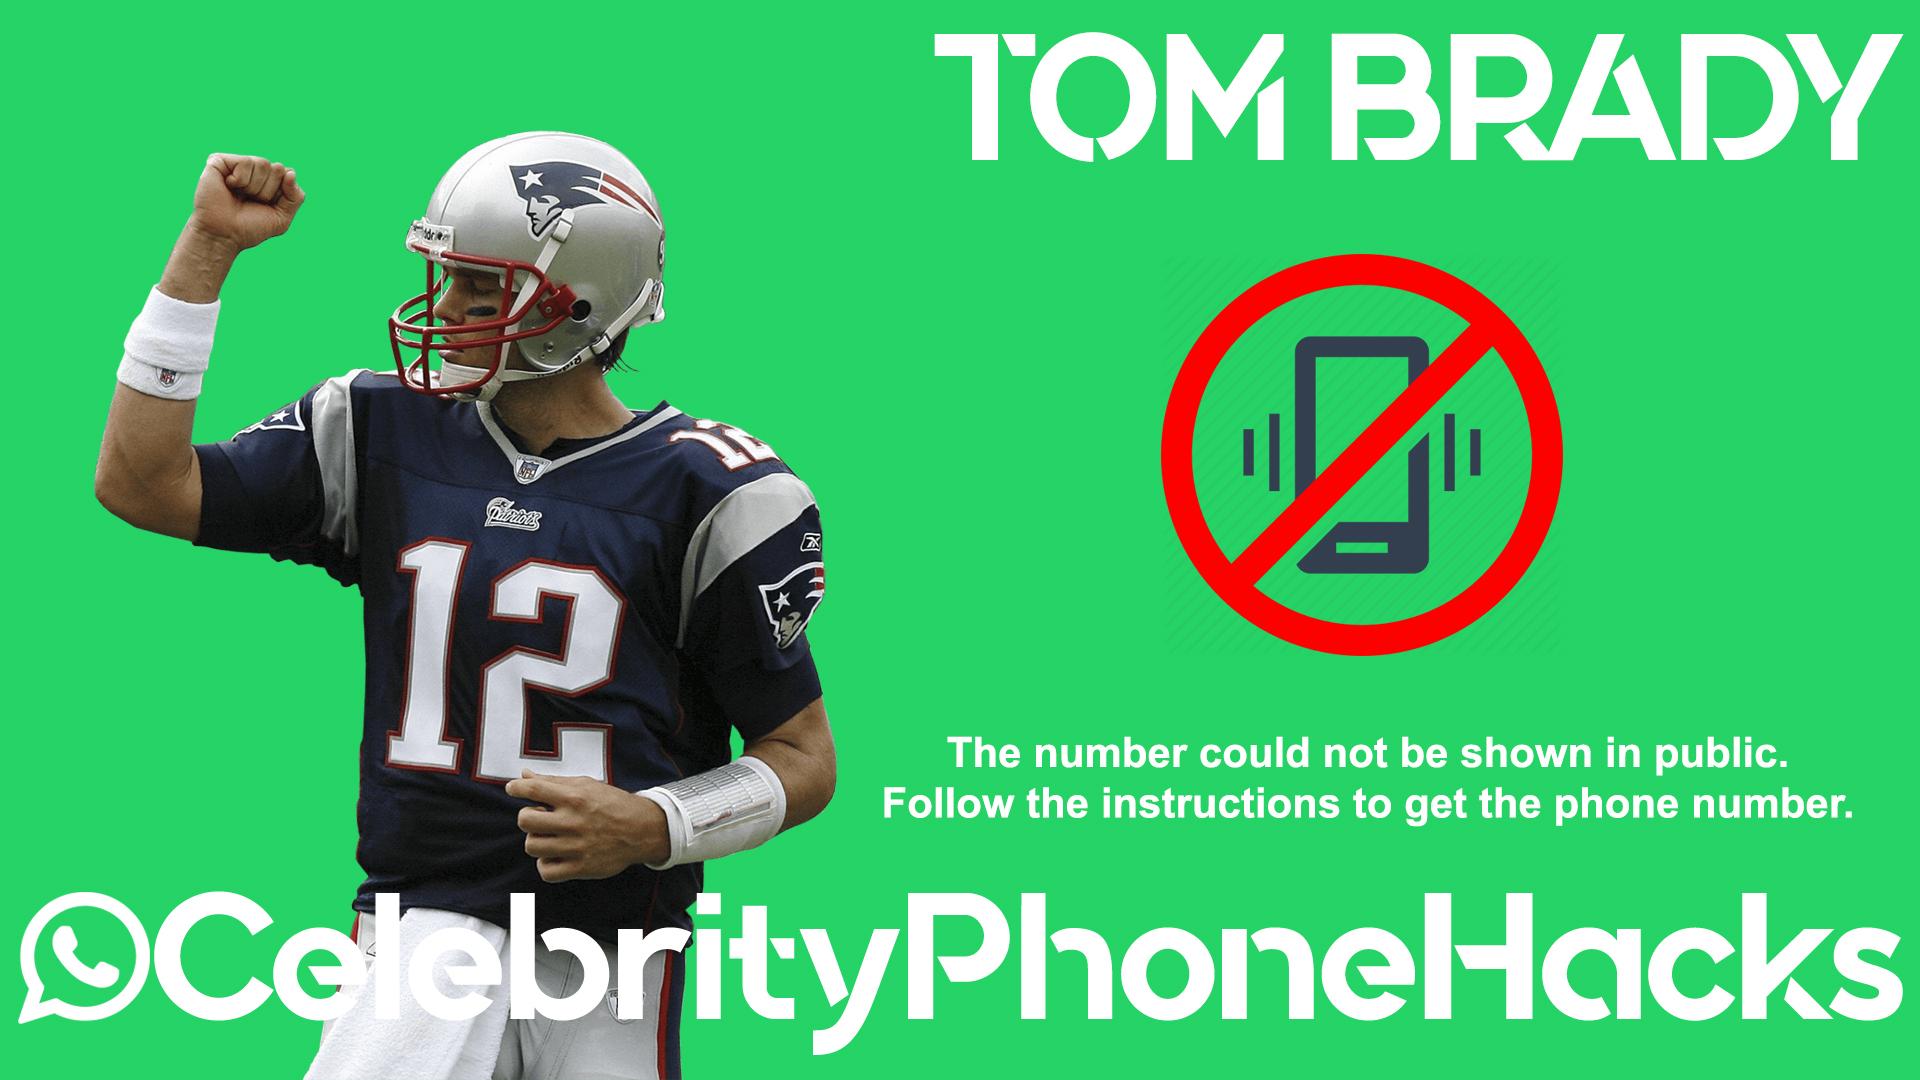 Tom Brady real phone number 2019 whatsapp hacked leaked